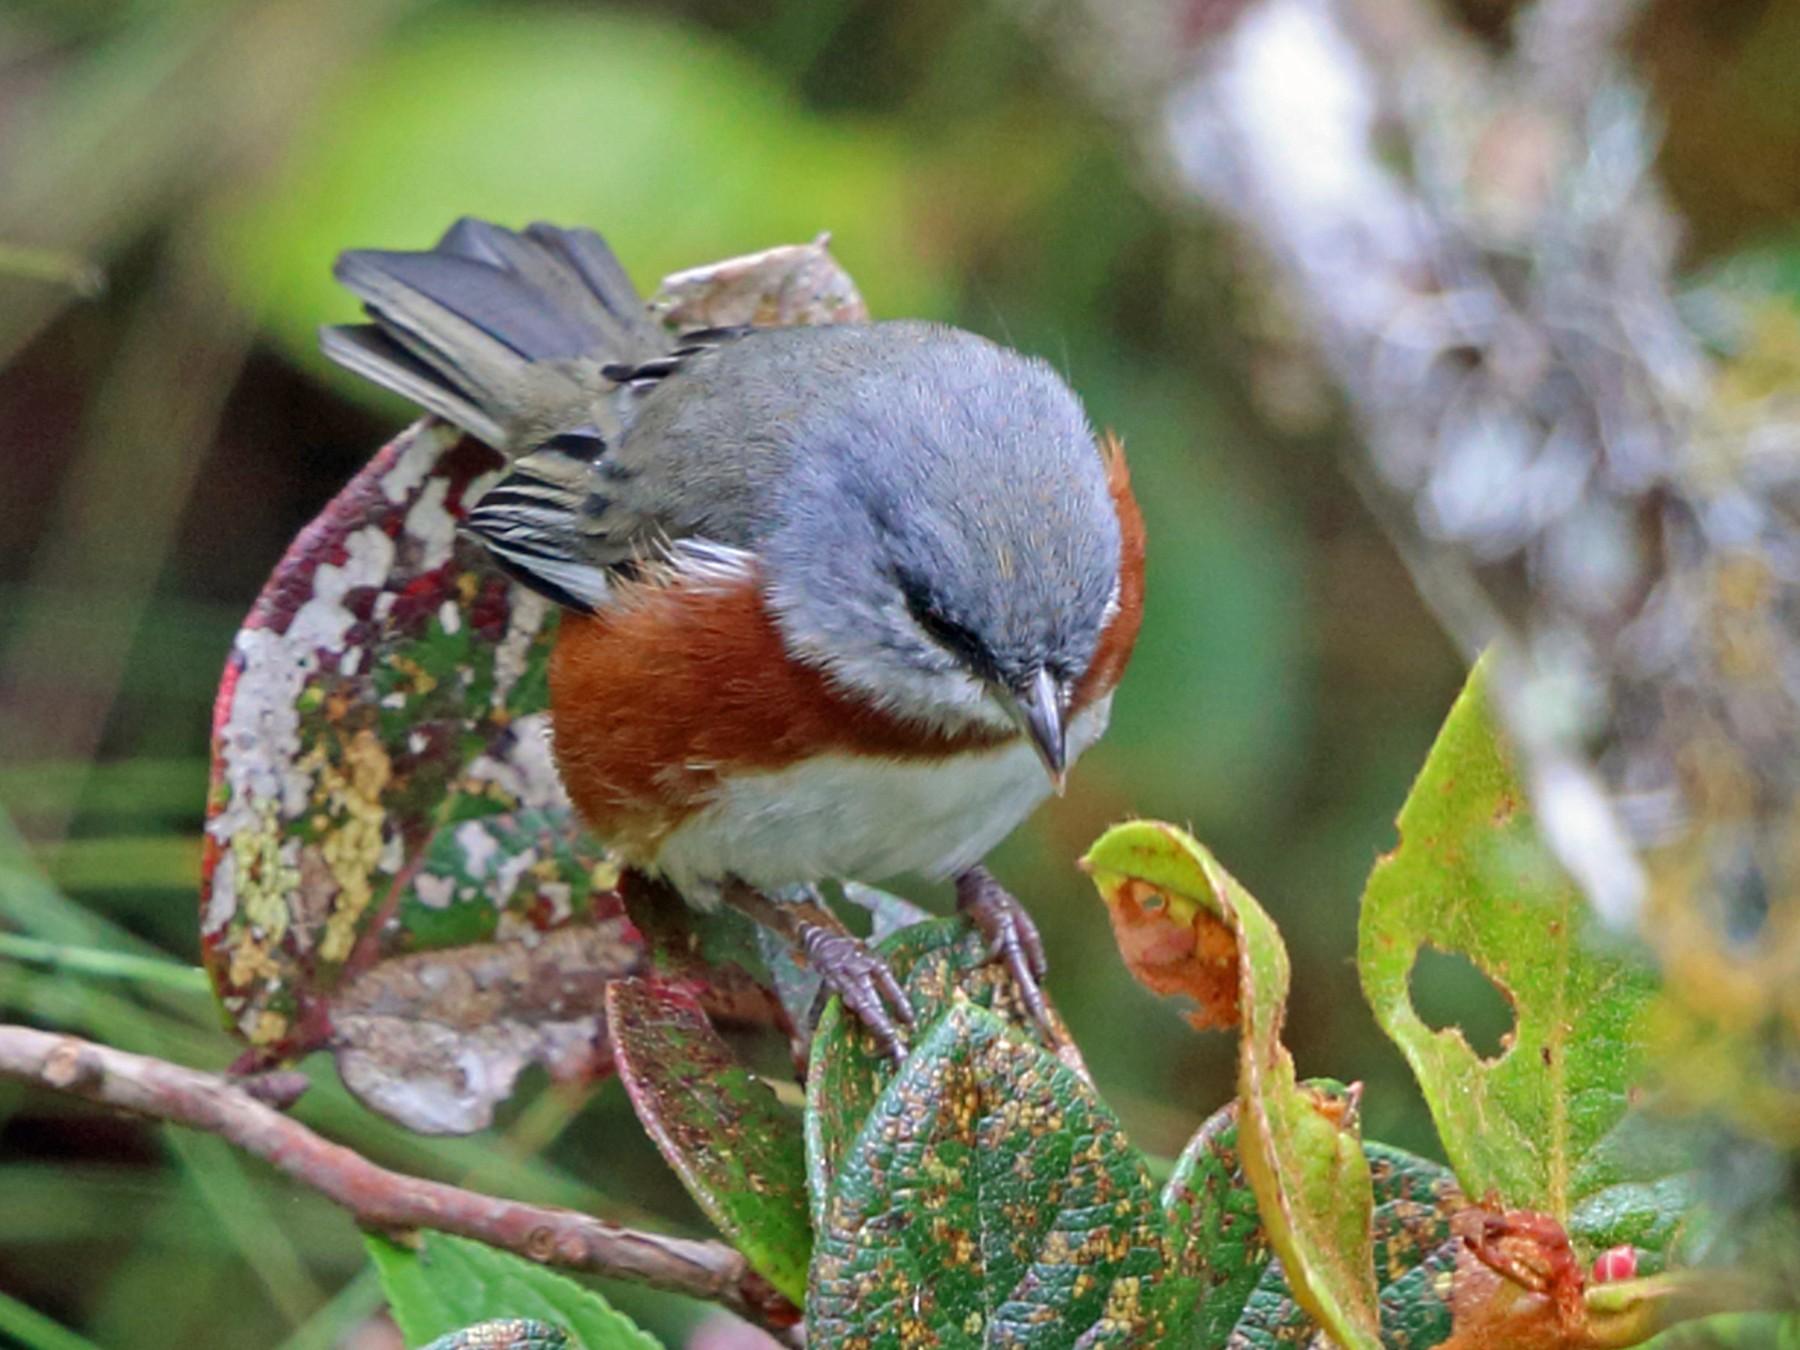 Bay-chested Warbling-Finch - Nigel Voaden